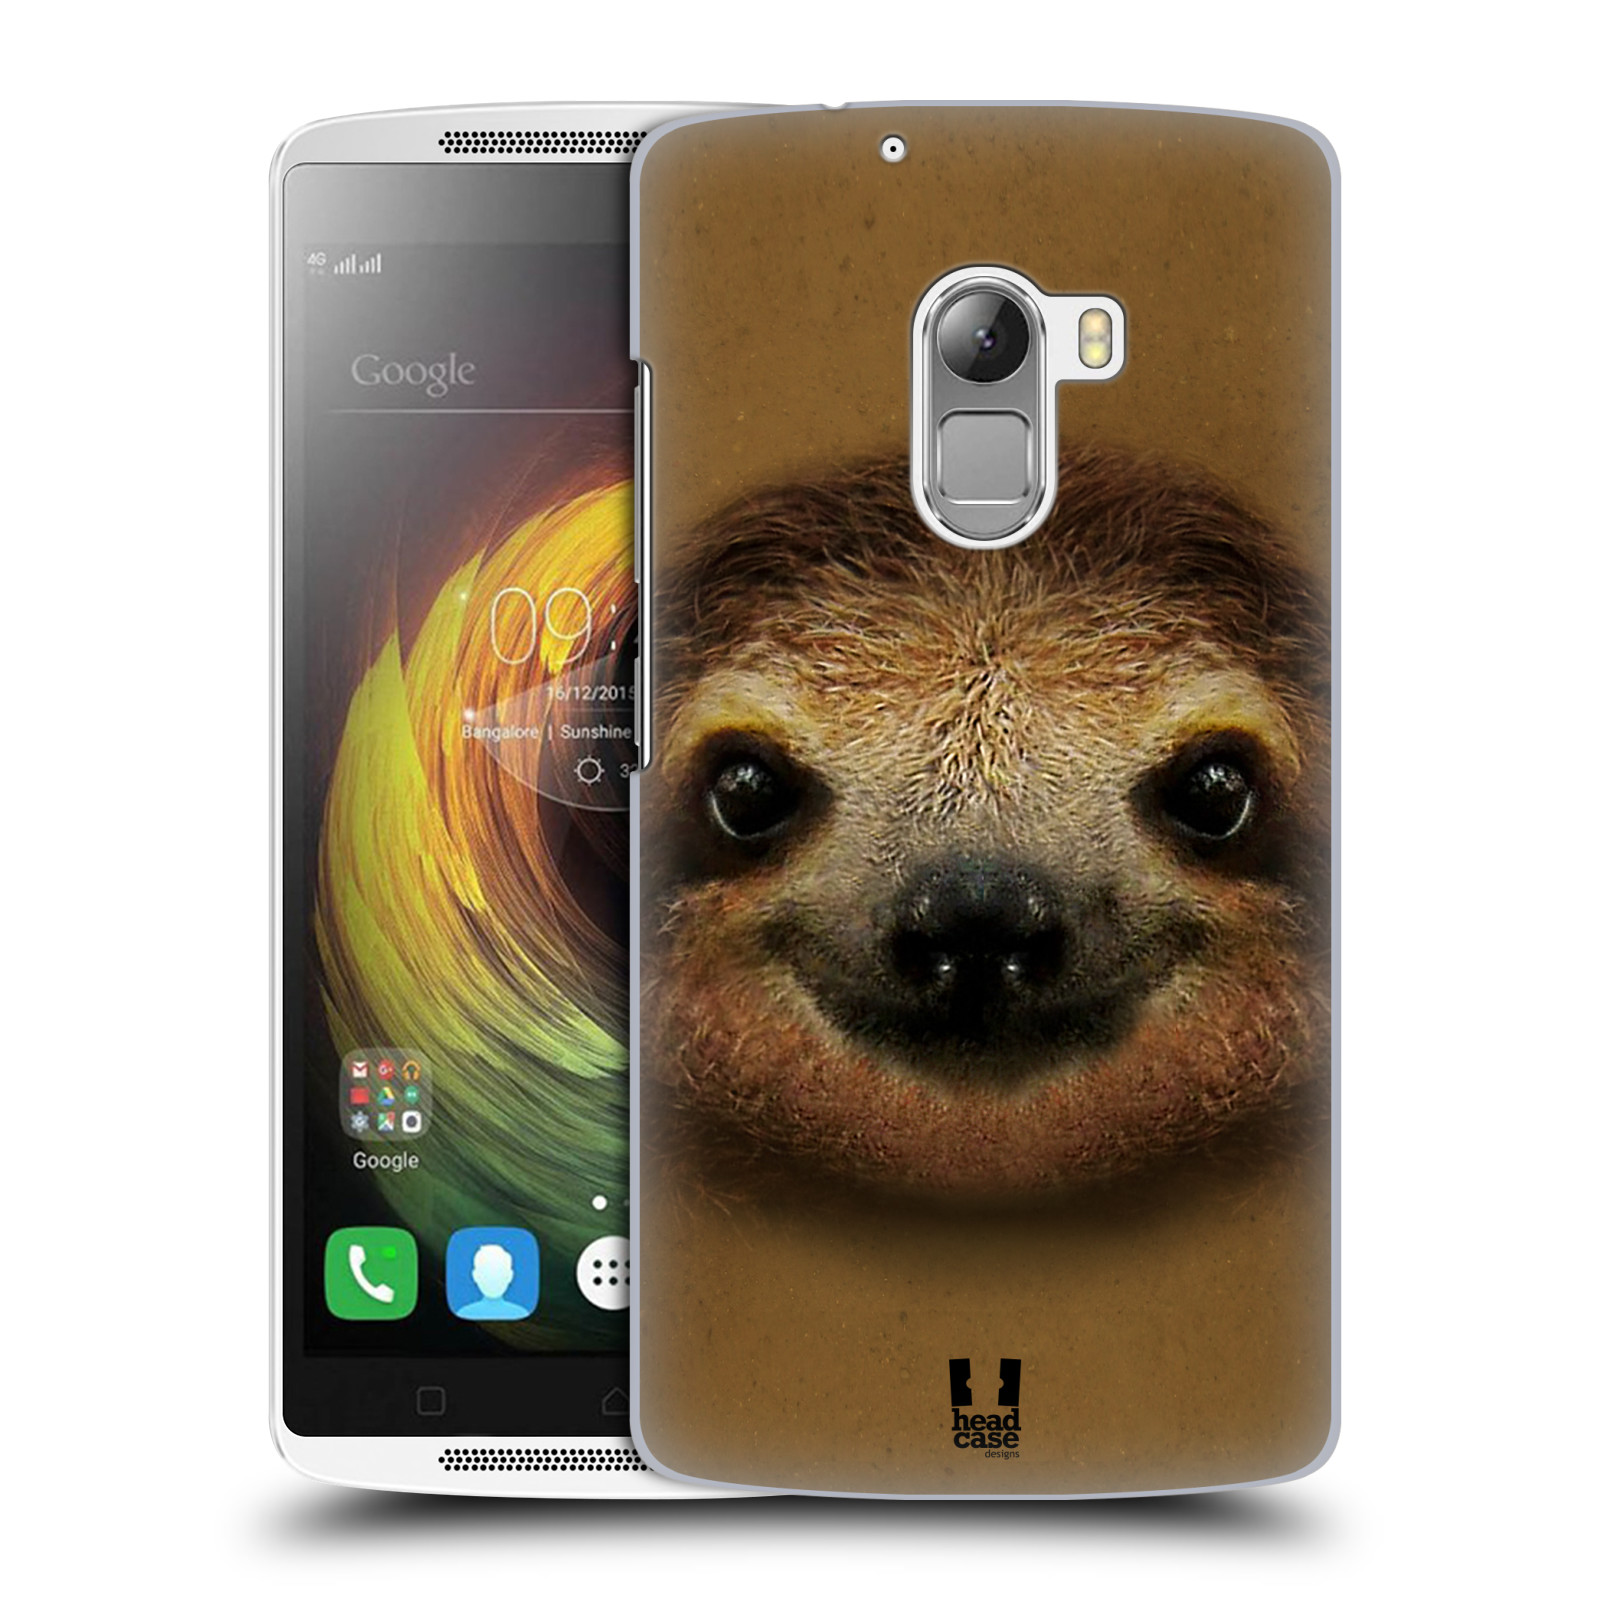 HEAD CASE pevný plastový obal na mobil LENOVO A7010 / A7010 DUAL / K4 Note / Vibe X3 lite vzor Zvířecí tváře 2 lenochod